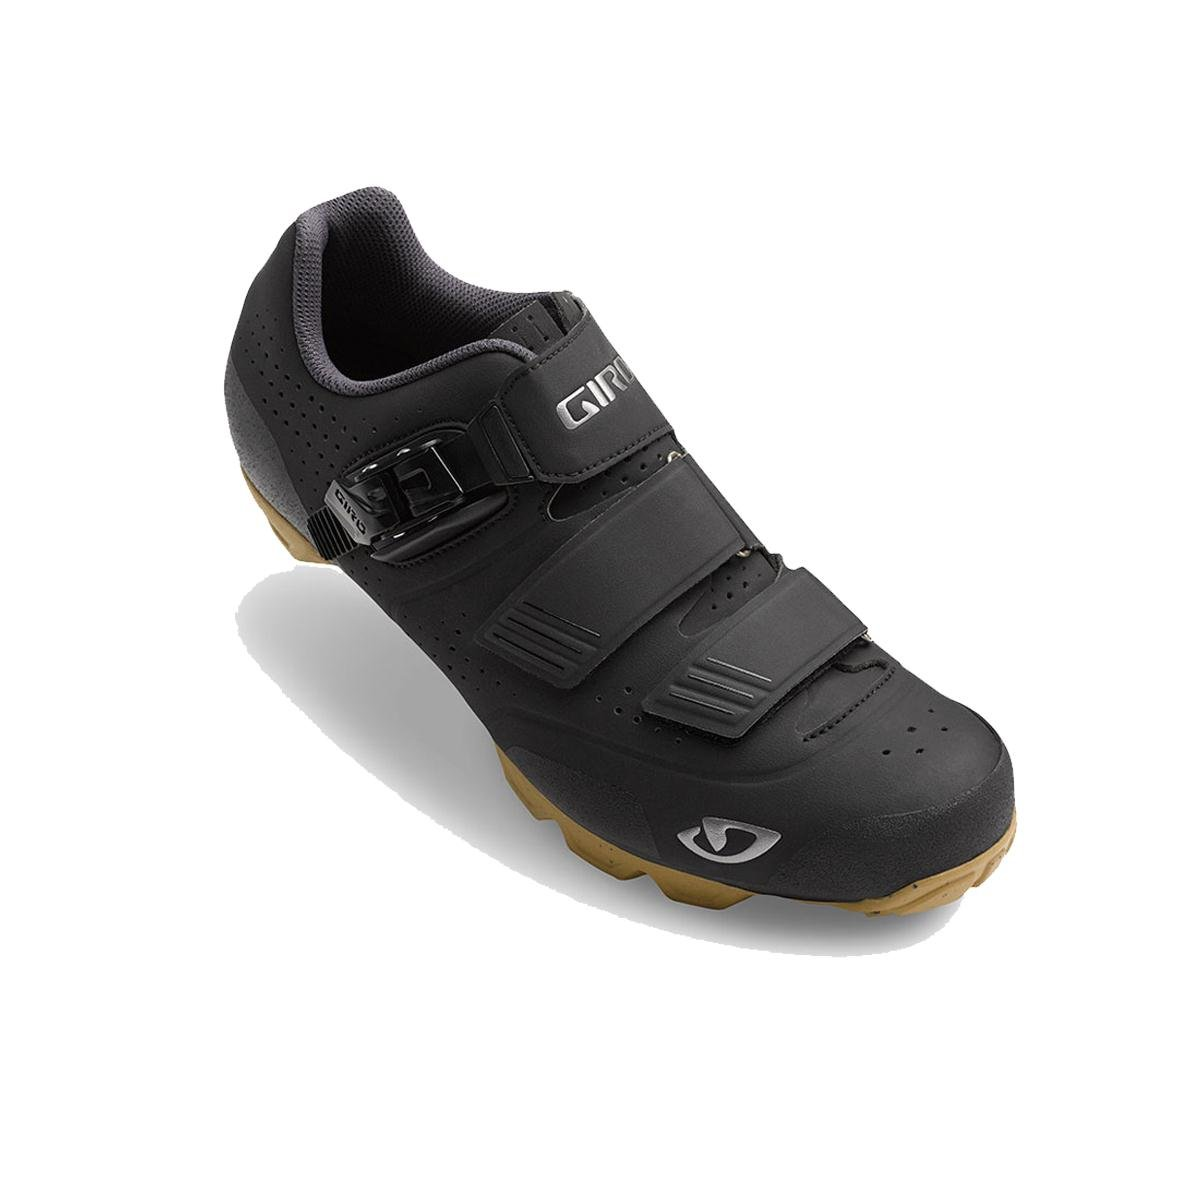 Giro Men's Privateer R B015T7BIEU 39.5 M EU Black/Gum